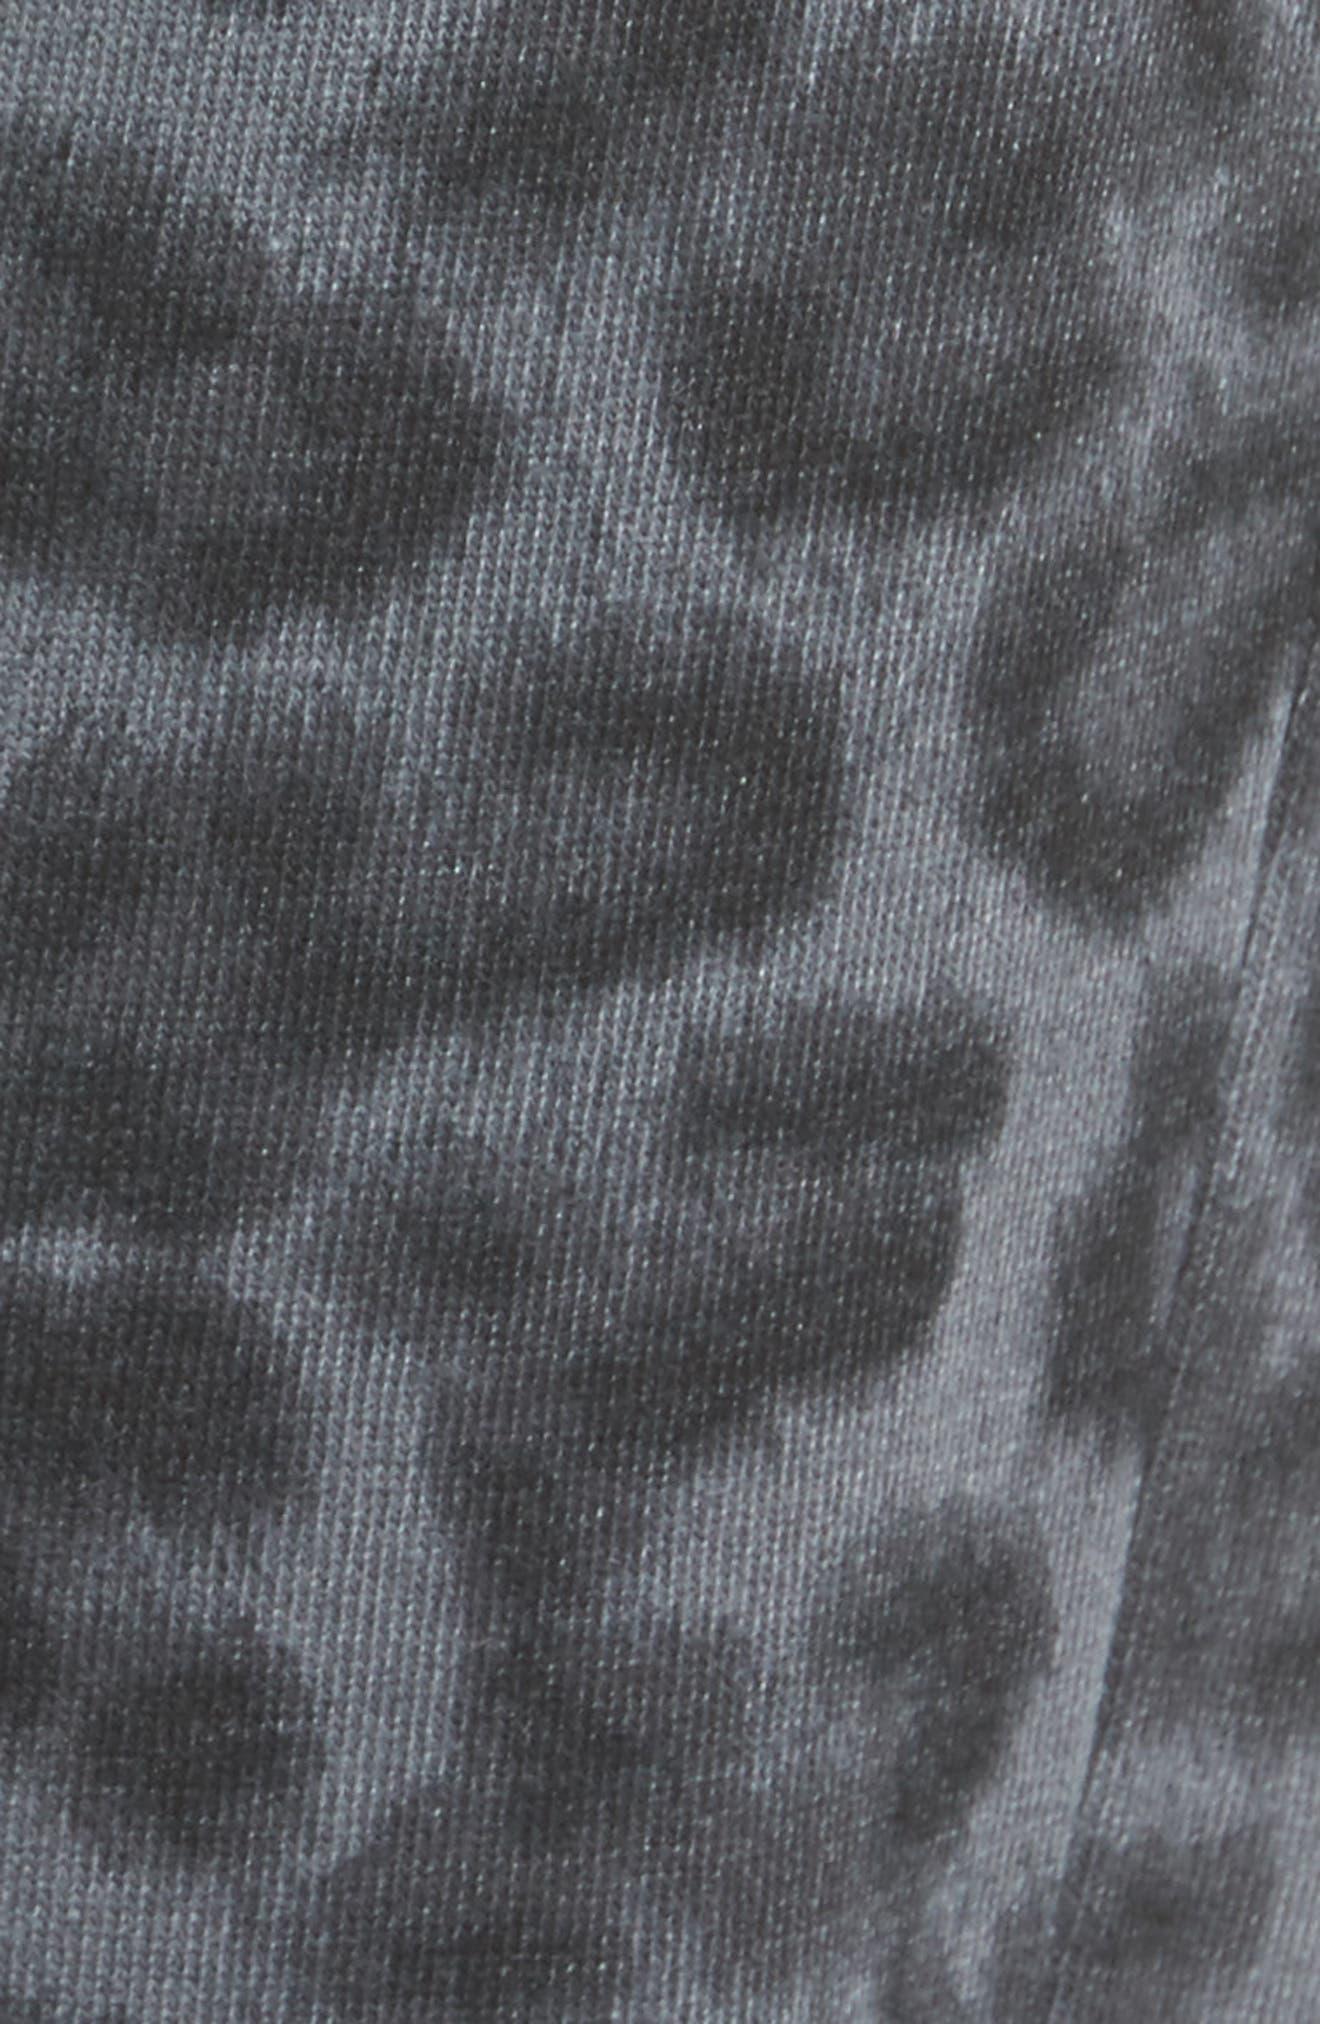 Leopard Print Jogger Pants,                             Alternate thumbnail 5, color,                             032